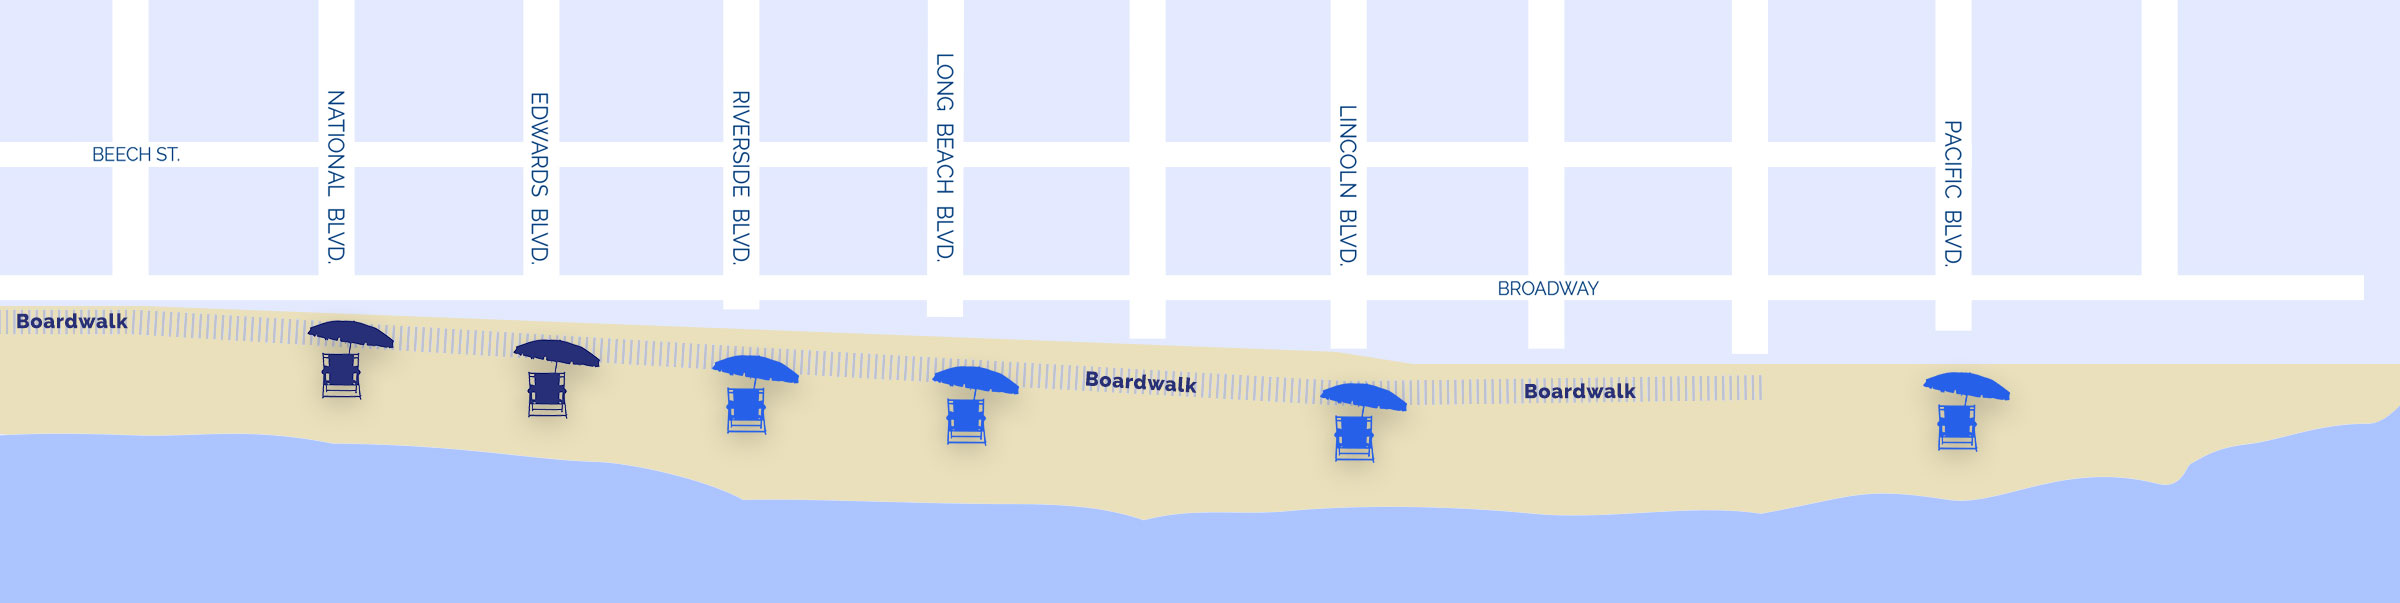 MAP-Desktop-sand-locations